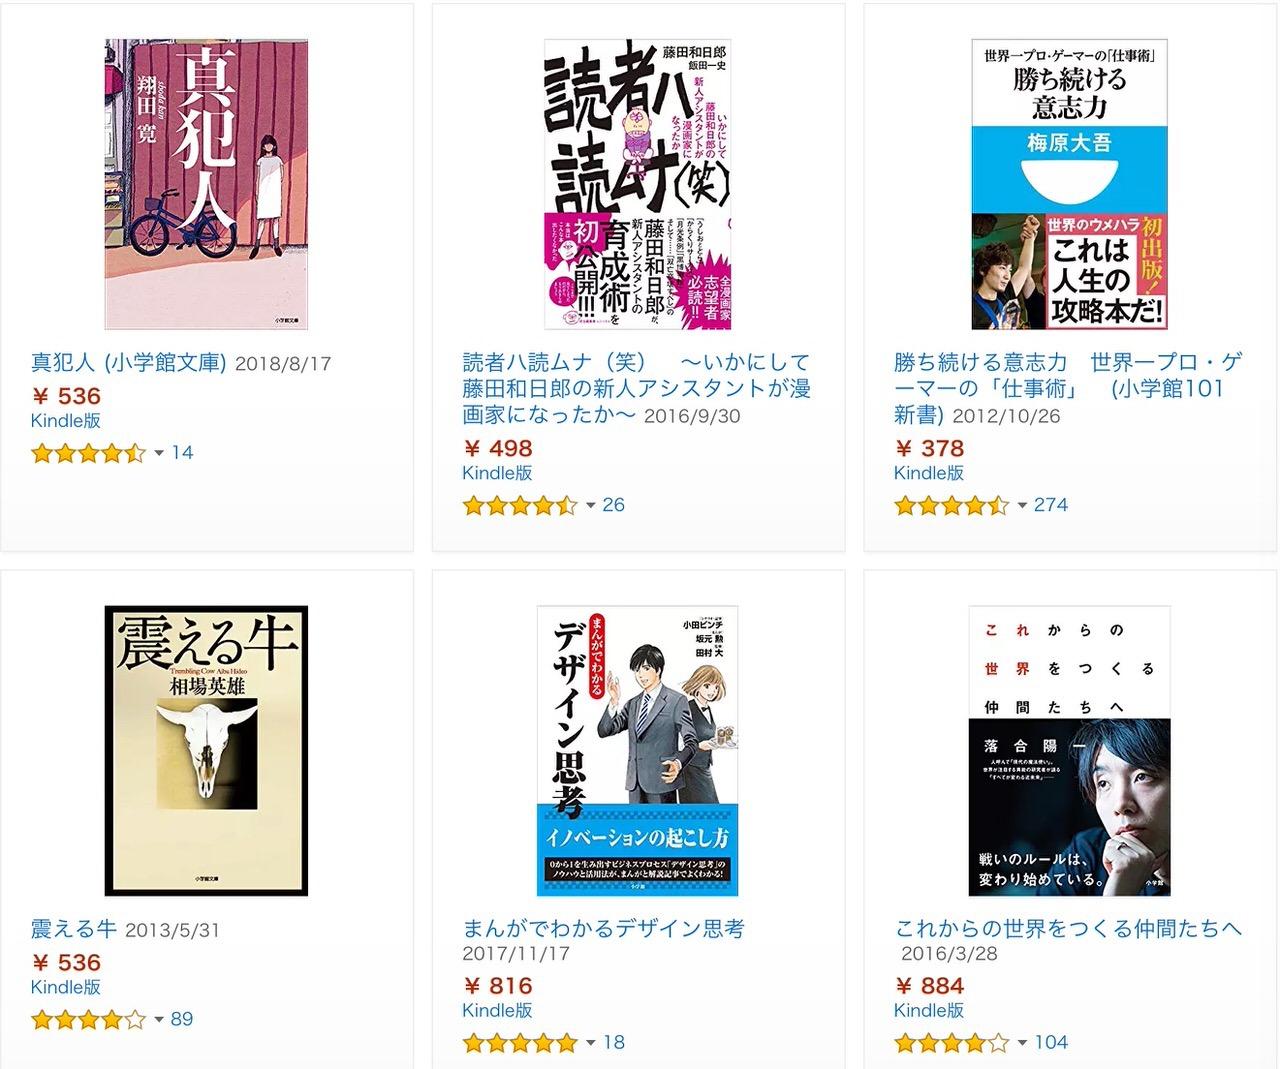 【Kindleセール】3,000冊以上が対象!「小学館 書籍・雑誌 30%OFFセール」(11/29まで)